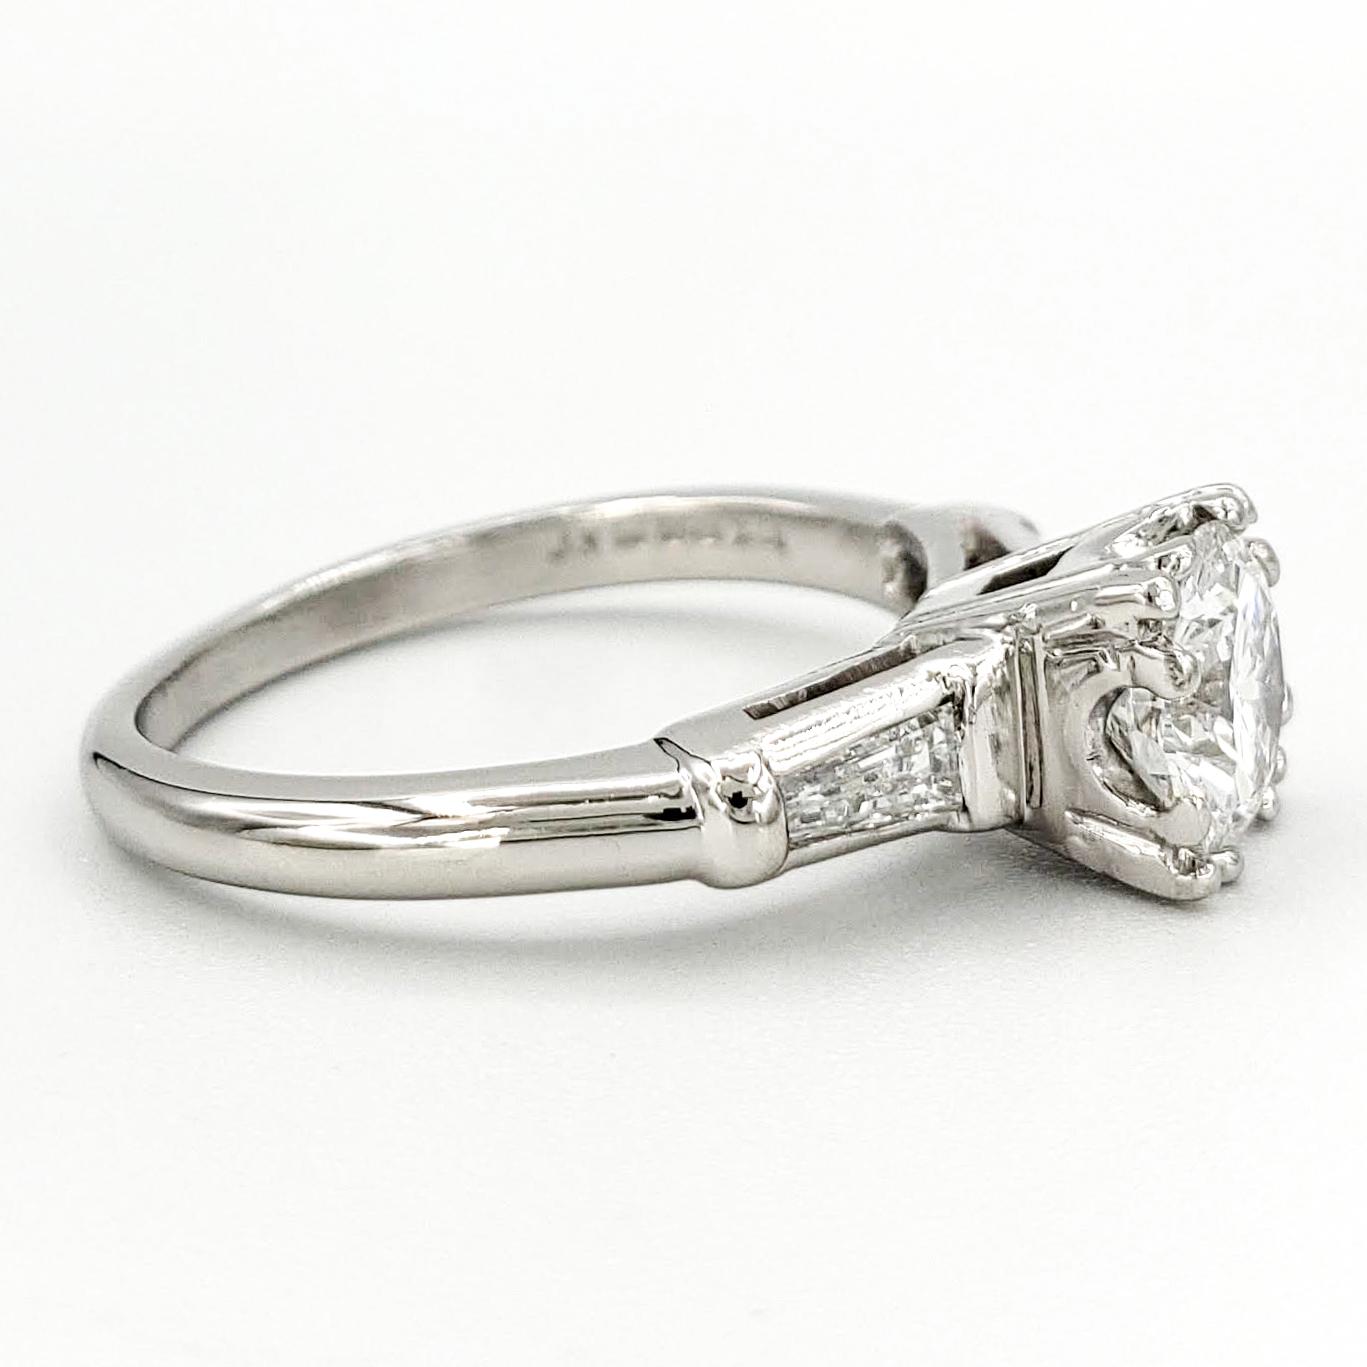 vintage-platinum-engagement-ring-with-0-76-carat-round-brilliant-cut-diamond-gia-d-vvs2